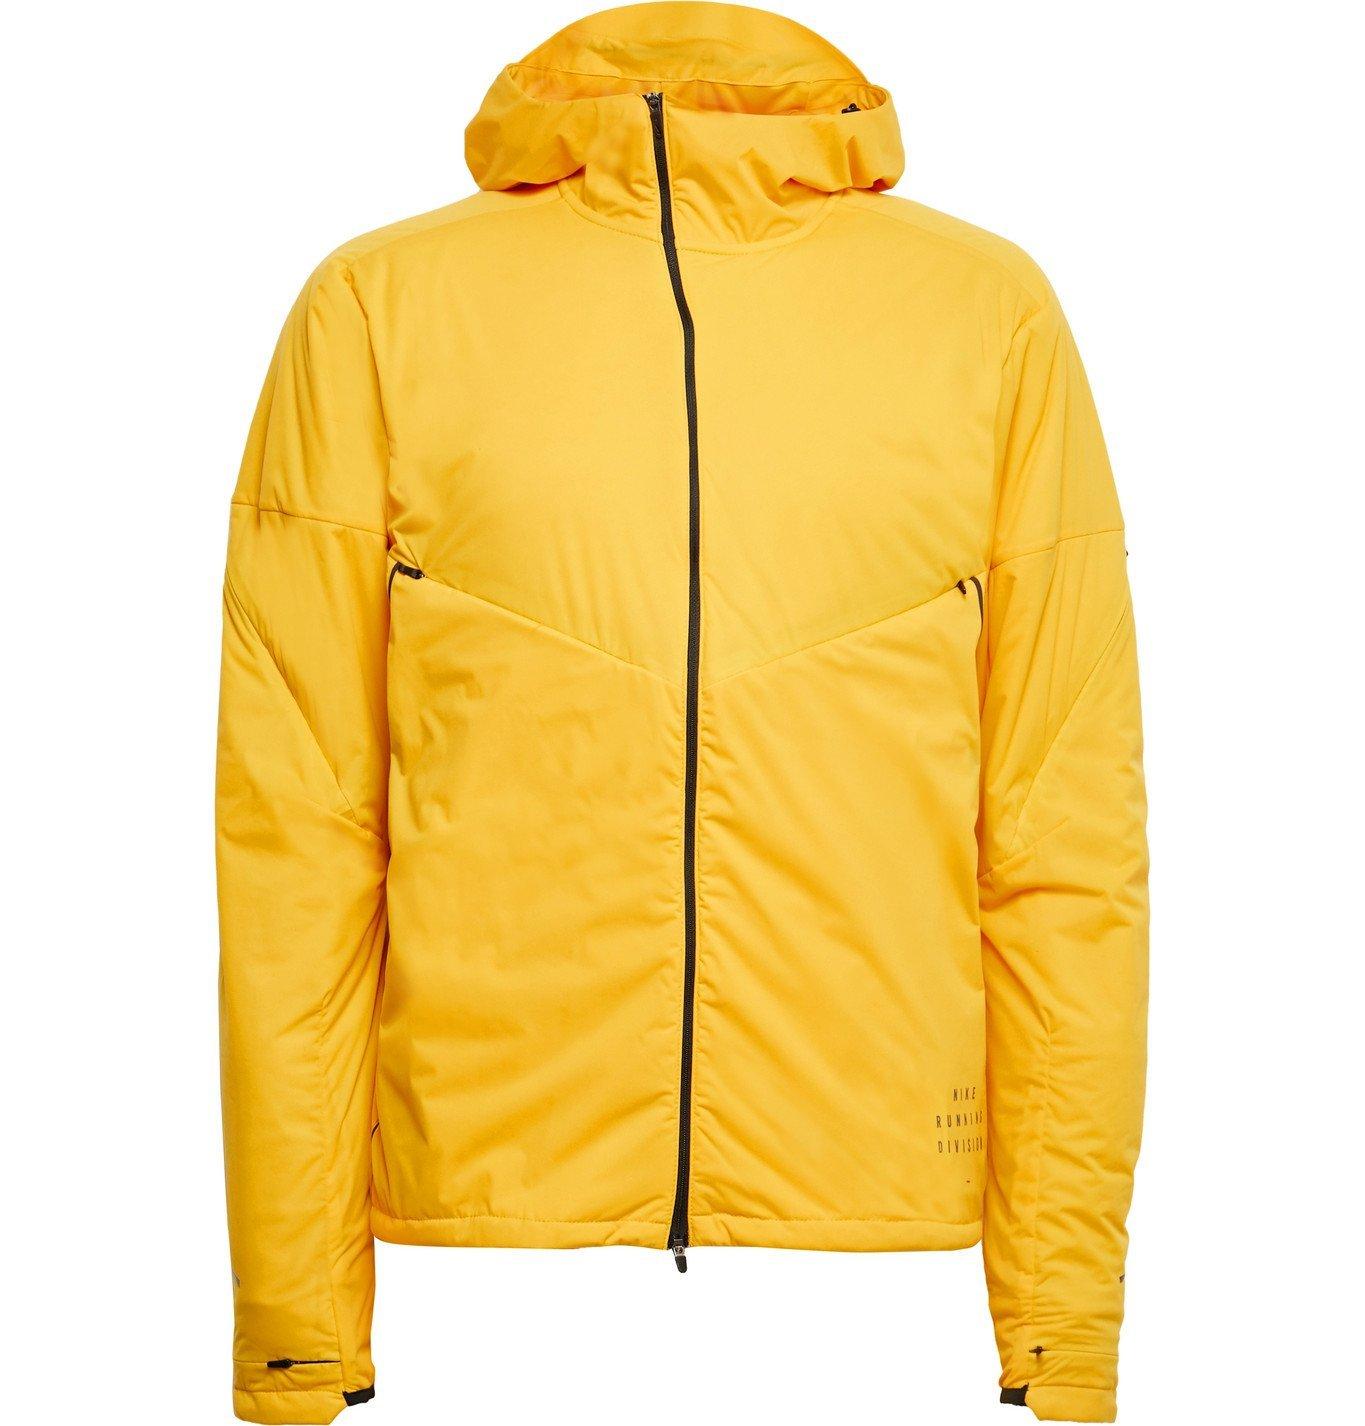 Nike Running - Run Division Dynamic Vent Logo-Print Shell Hooded Jacket - Yellow